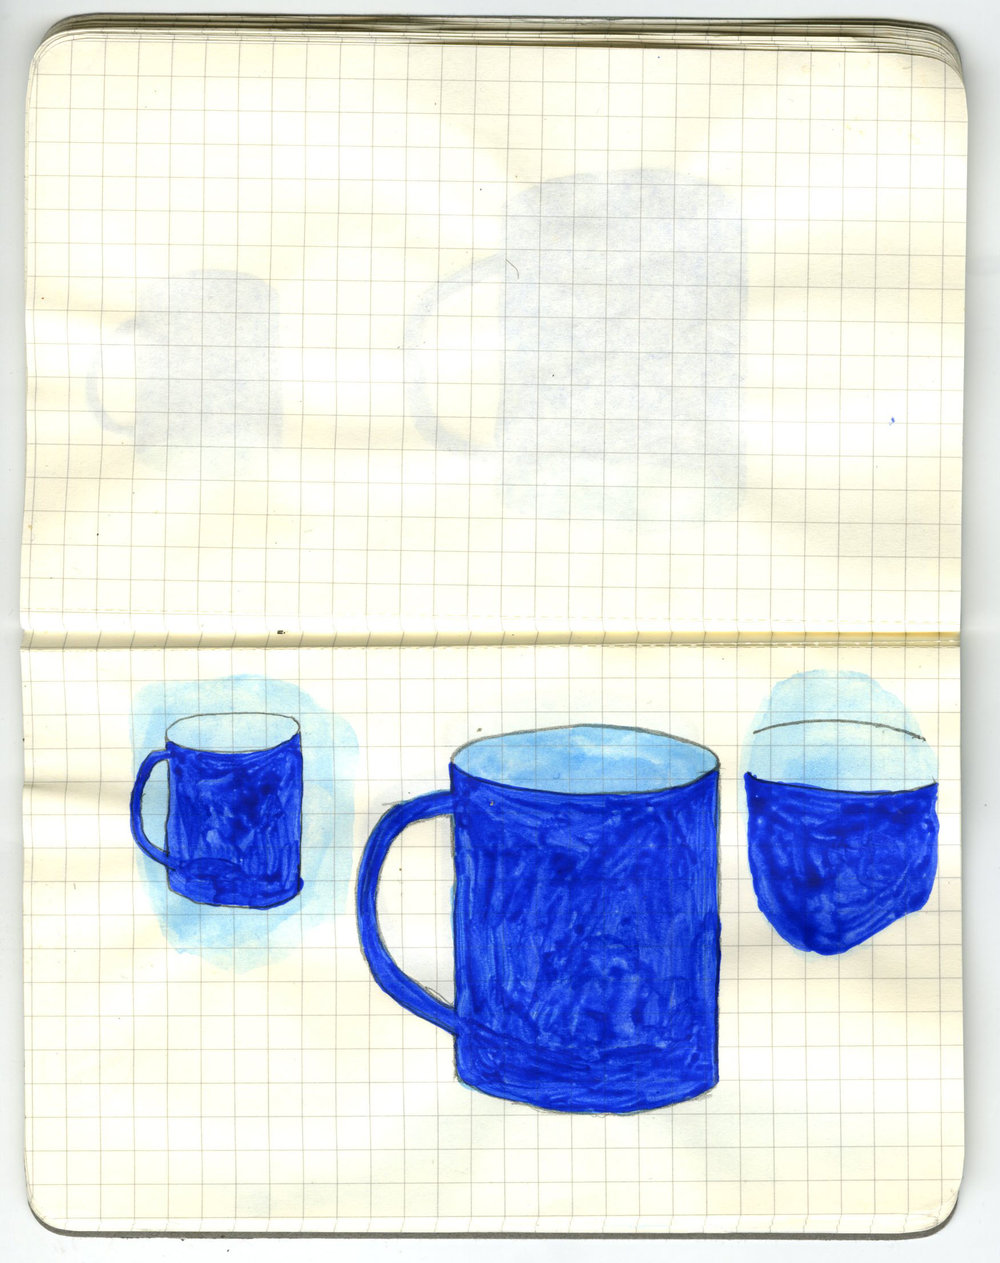 cup019.jpg